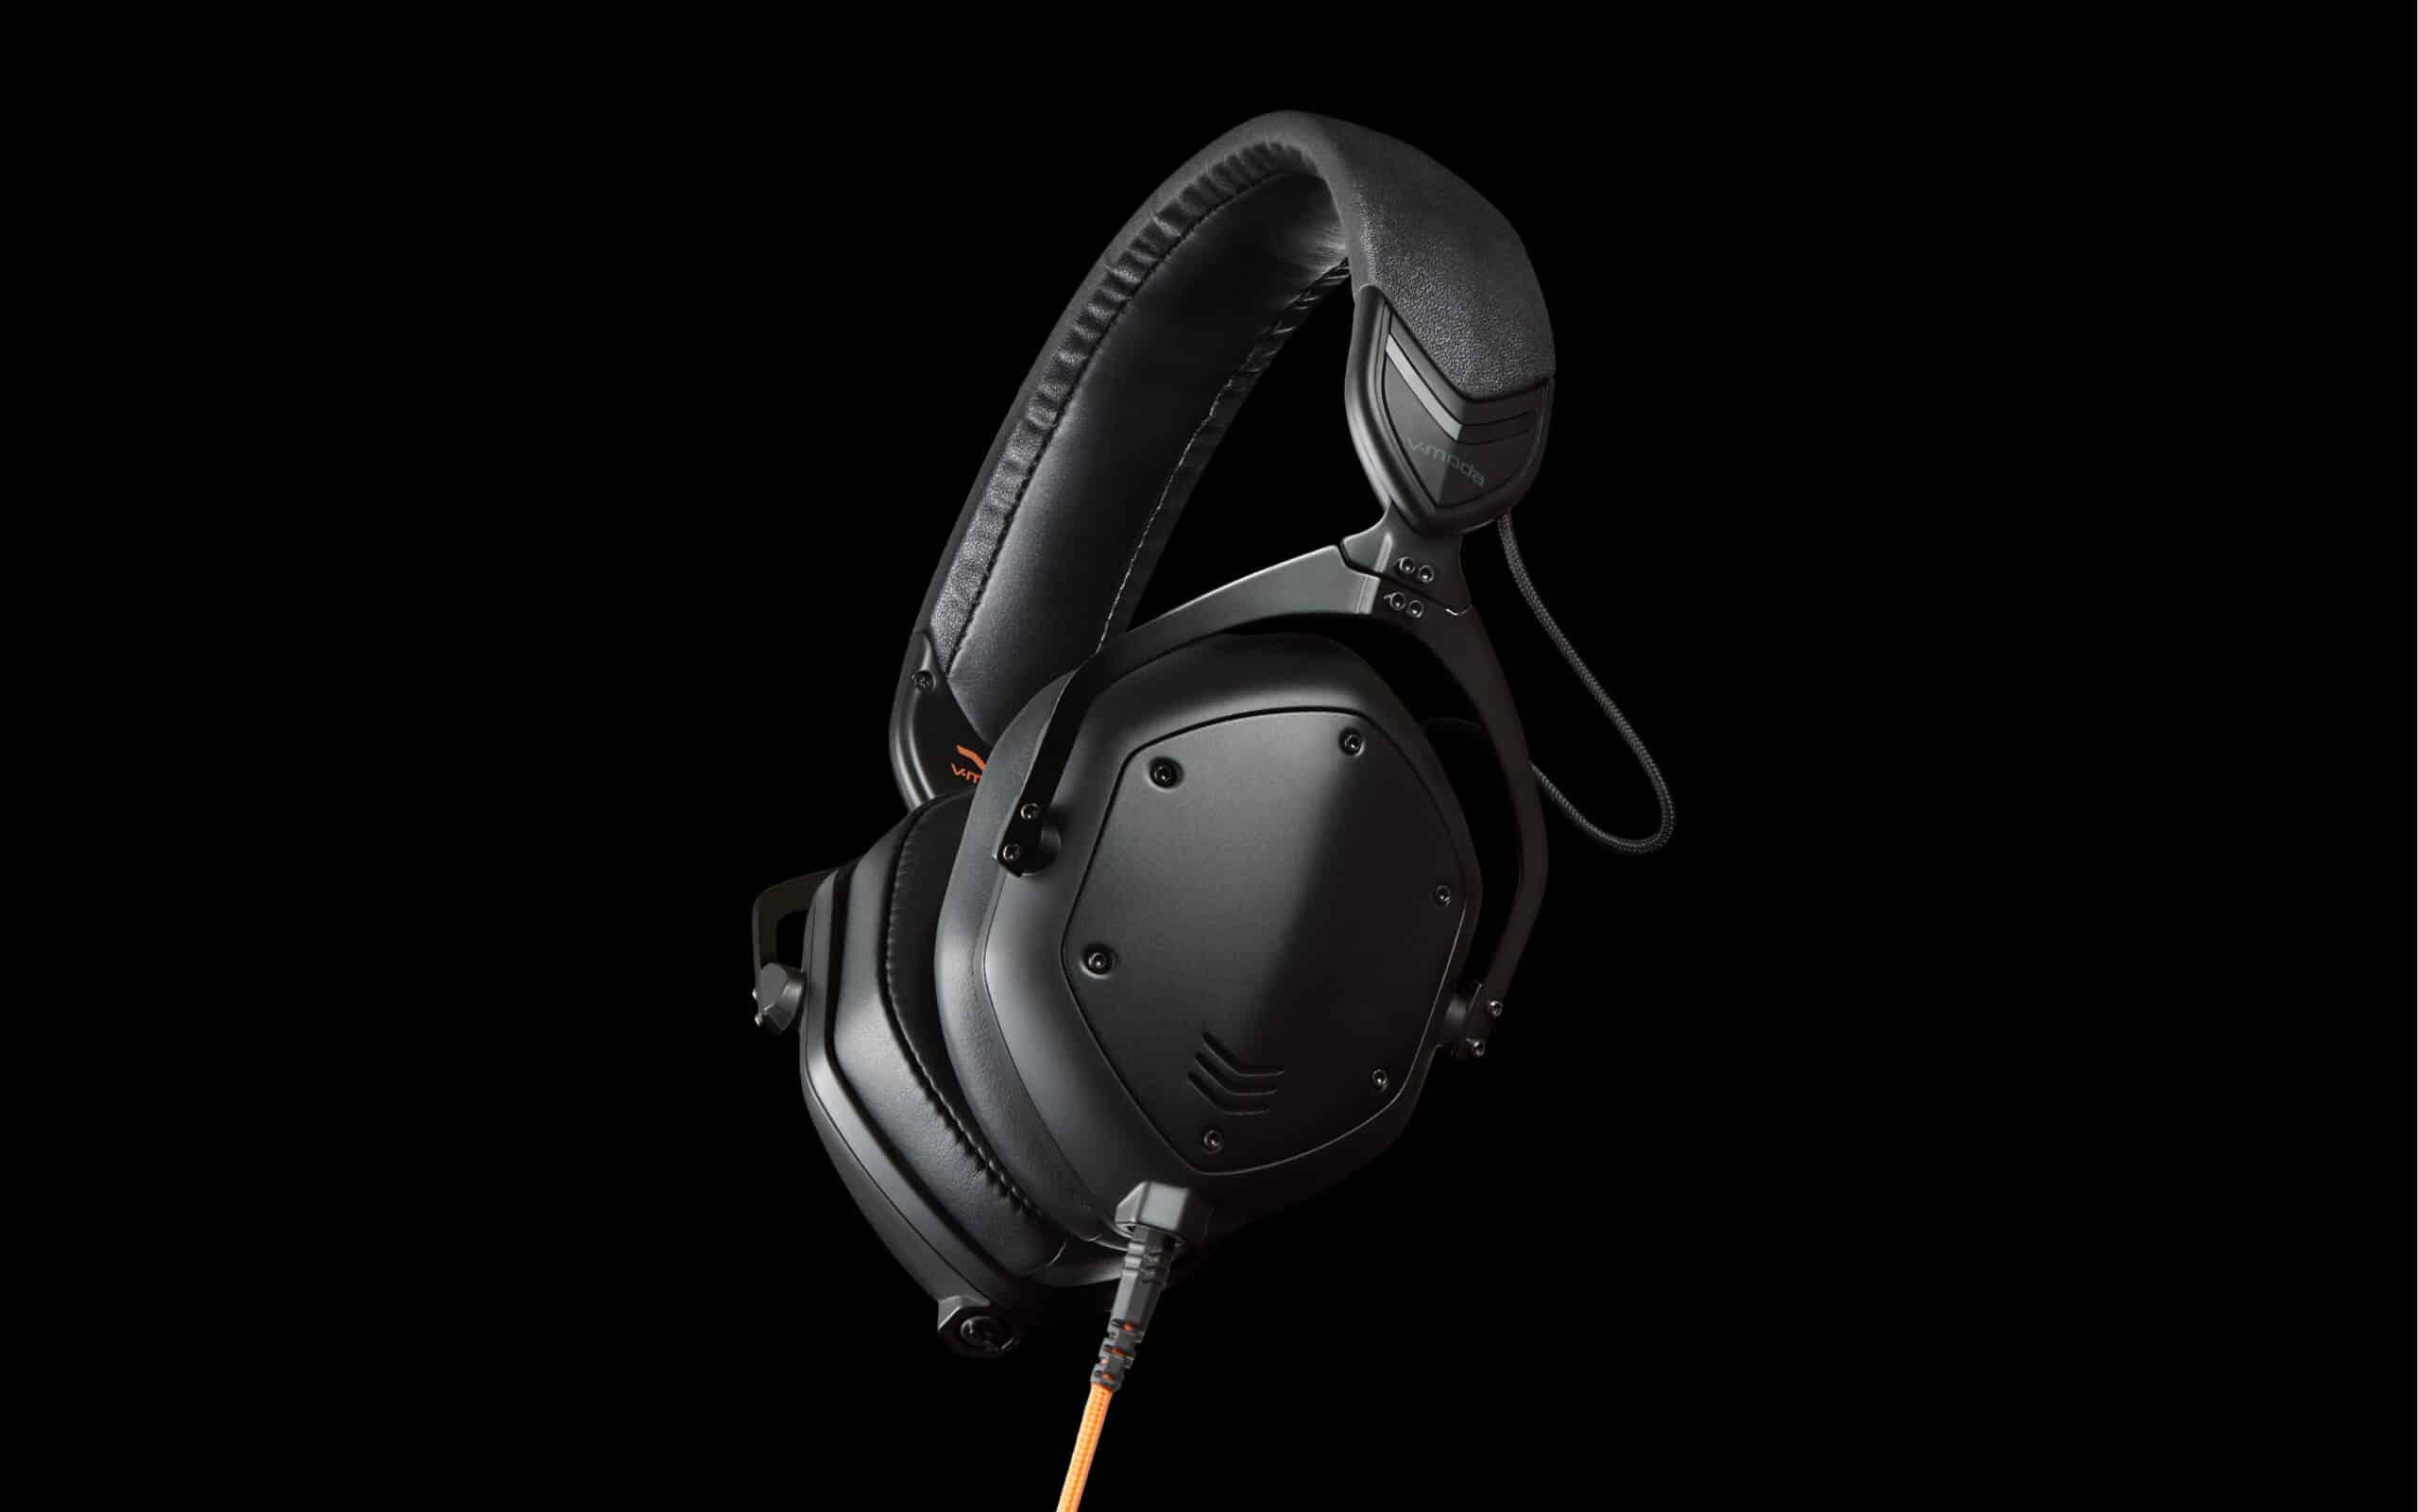 V-Moda Crossfade M-100 Master Headphones